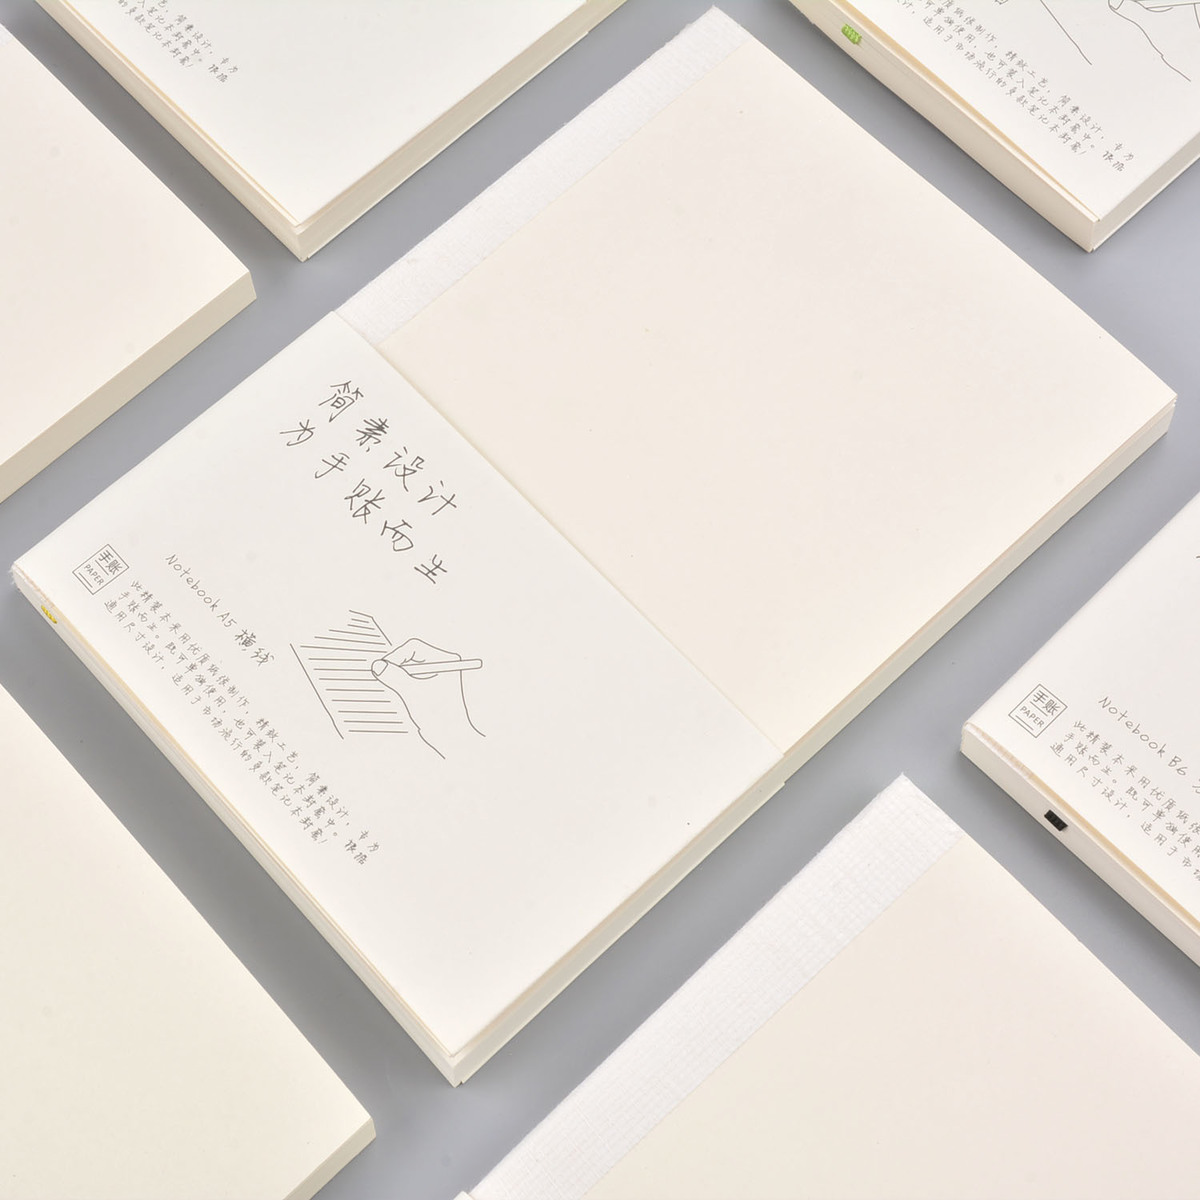 Moterm Notebook tagebuch einsatz refill für A5 B6 A6 größe Leder abdeckung Gitter Gefüttert Blank journal mit 100g Große papier